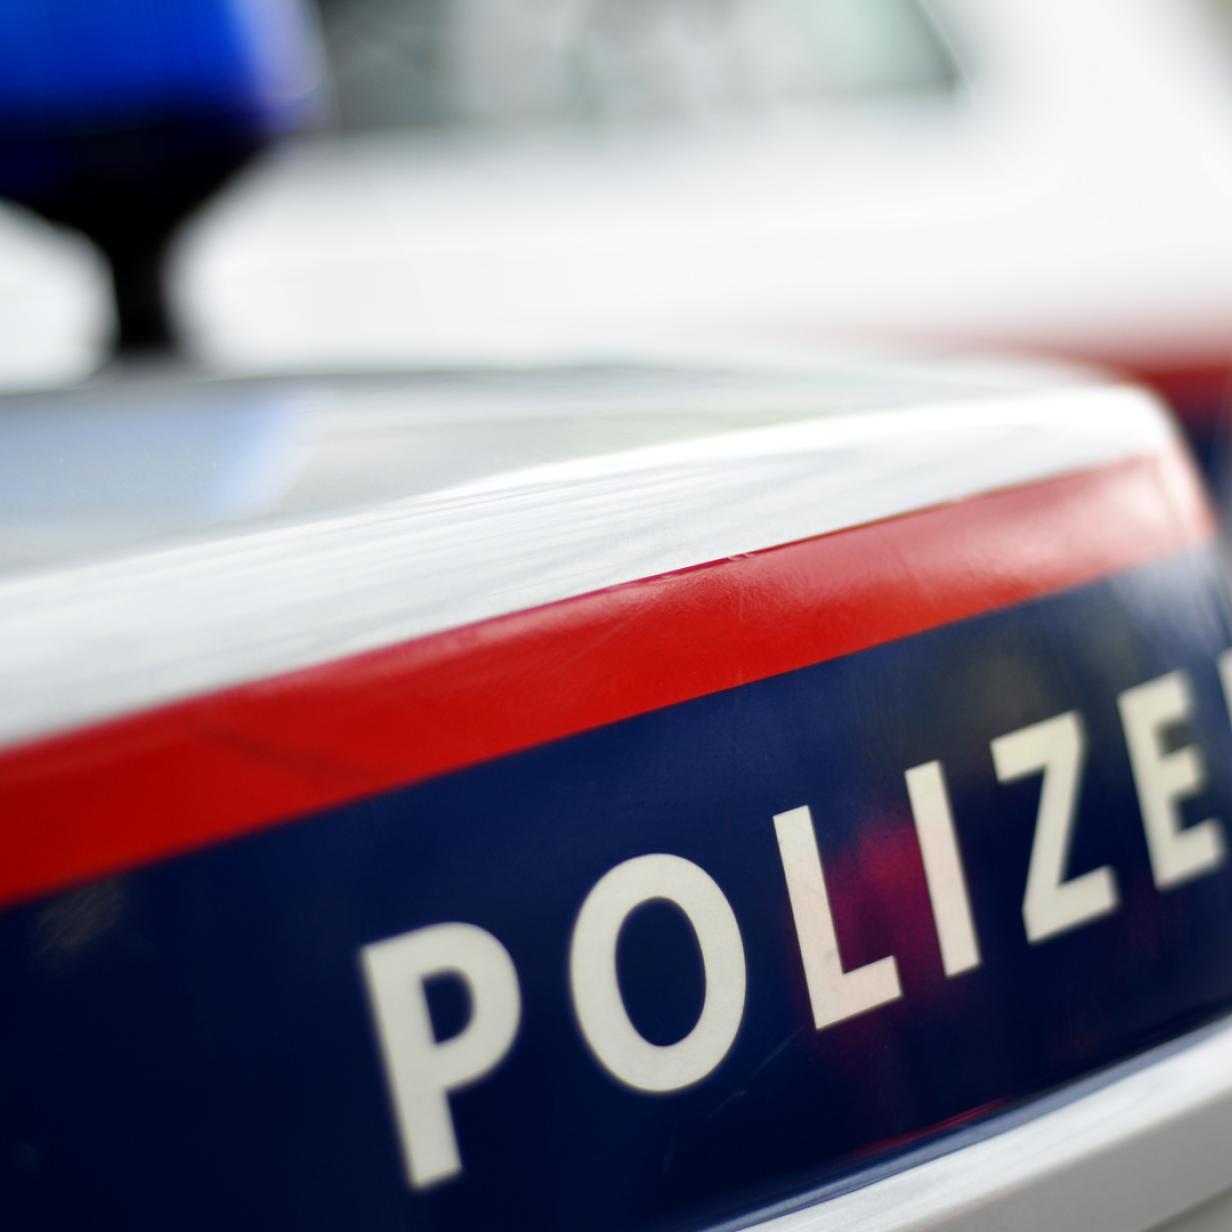 Wien: Sohn rammte Vater Küchenmesser in den Rücken